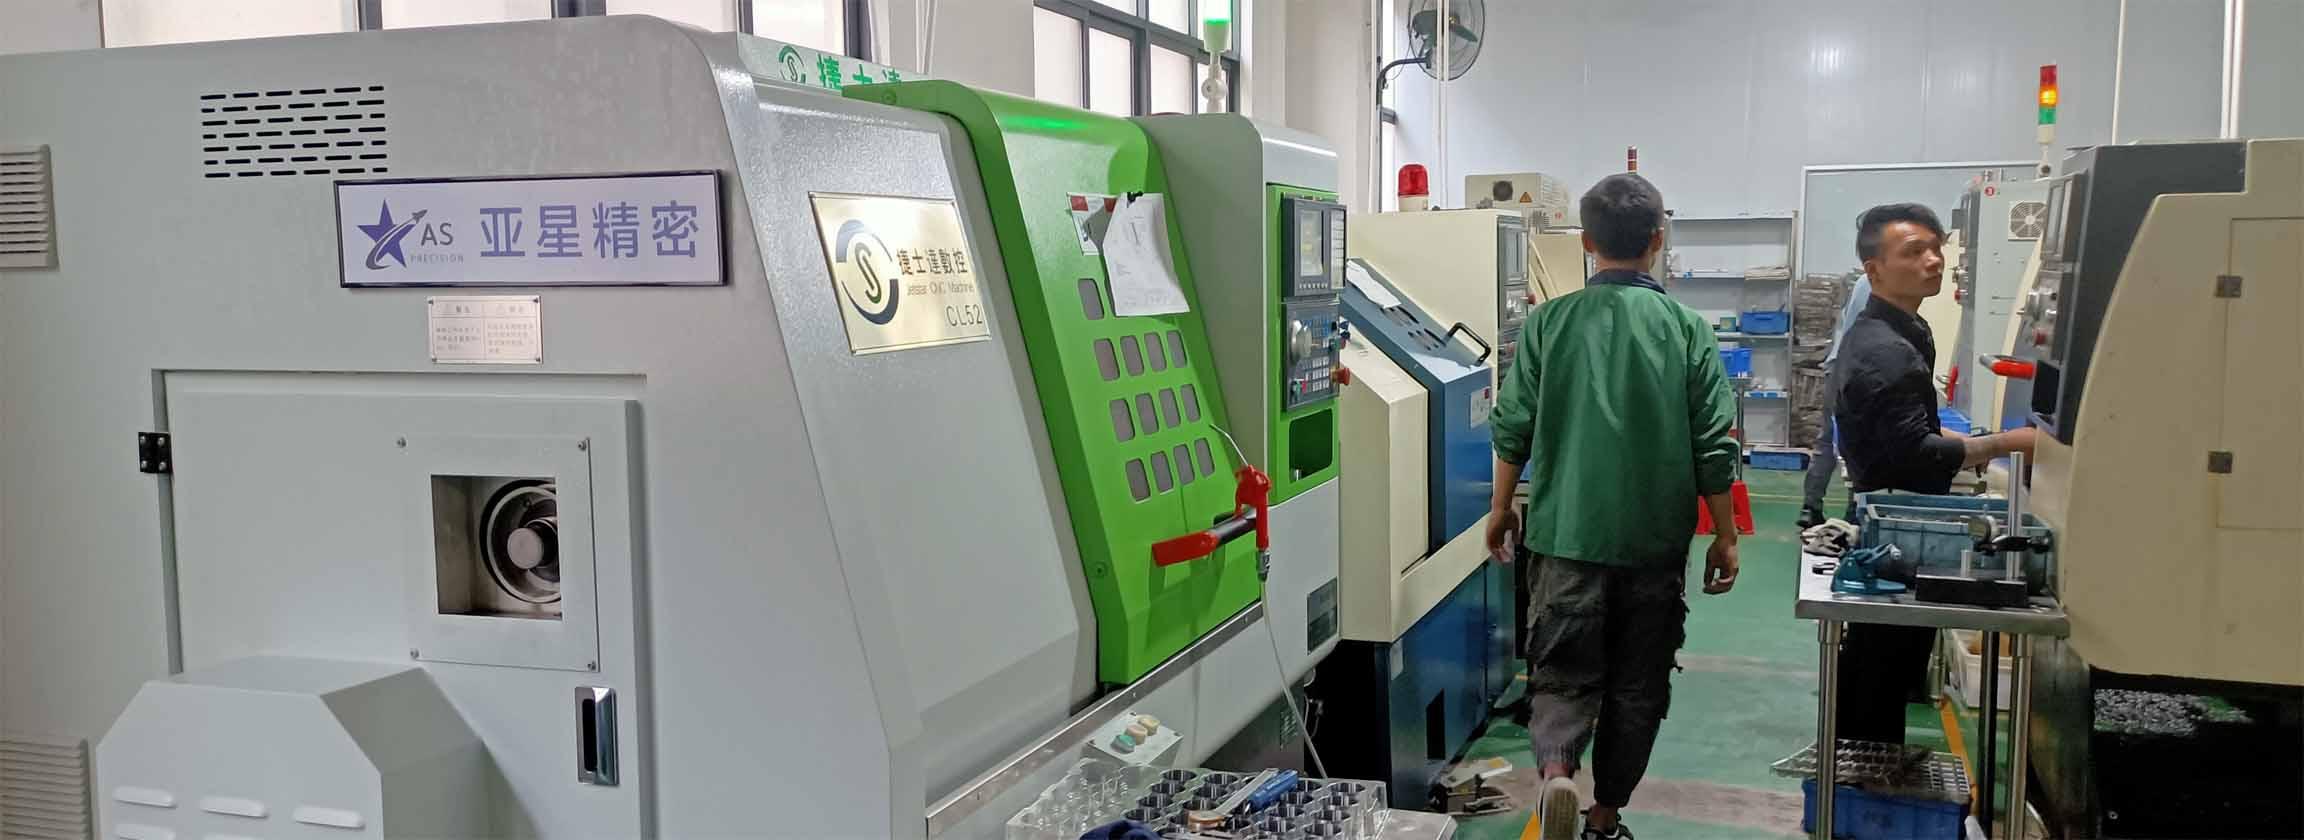 AS PRECISION, CNC MACHINING SERVICE SUPPLIER